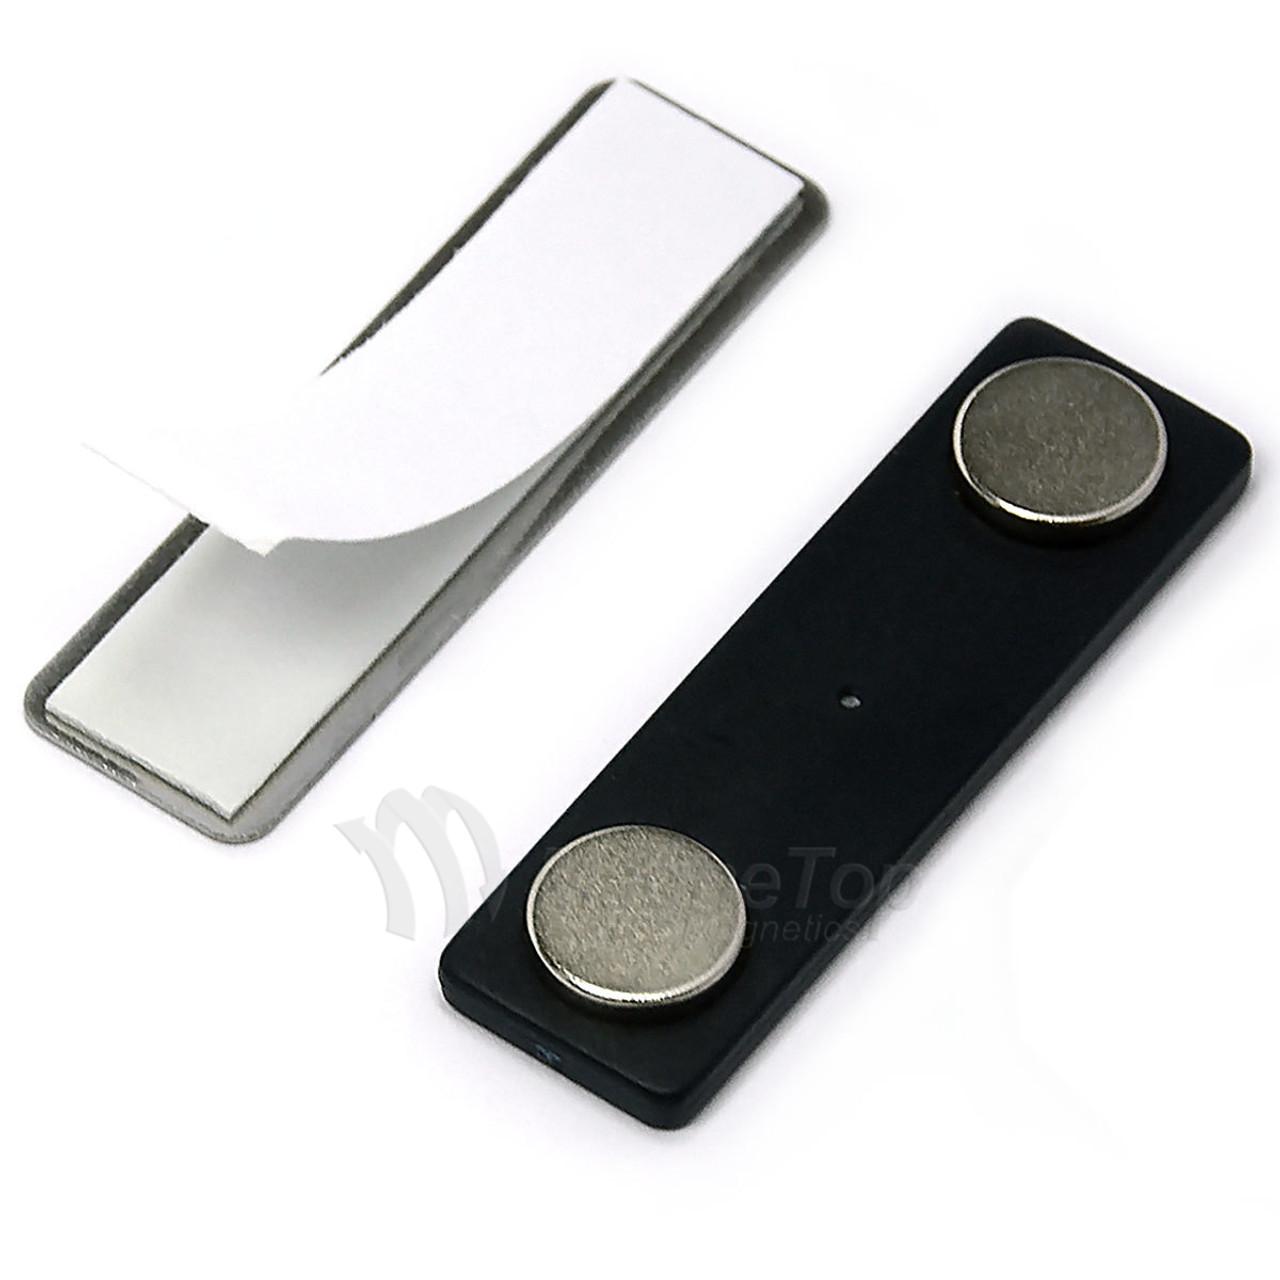 Name Tag Badge Magnet Set of 100 /w Adhesive 2MG4